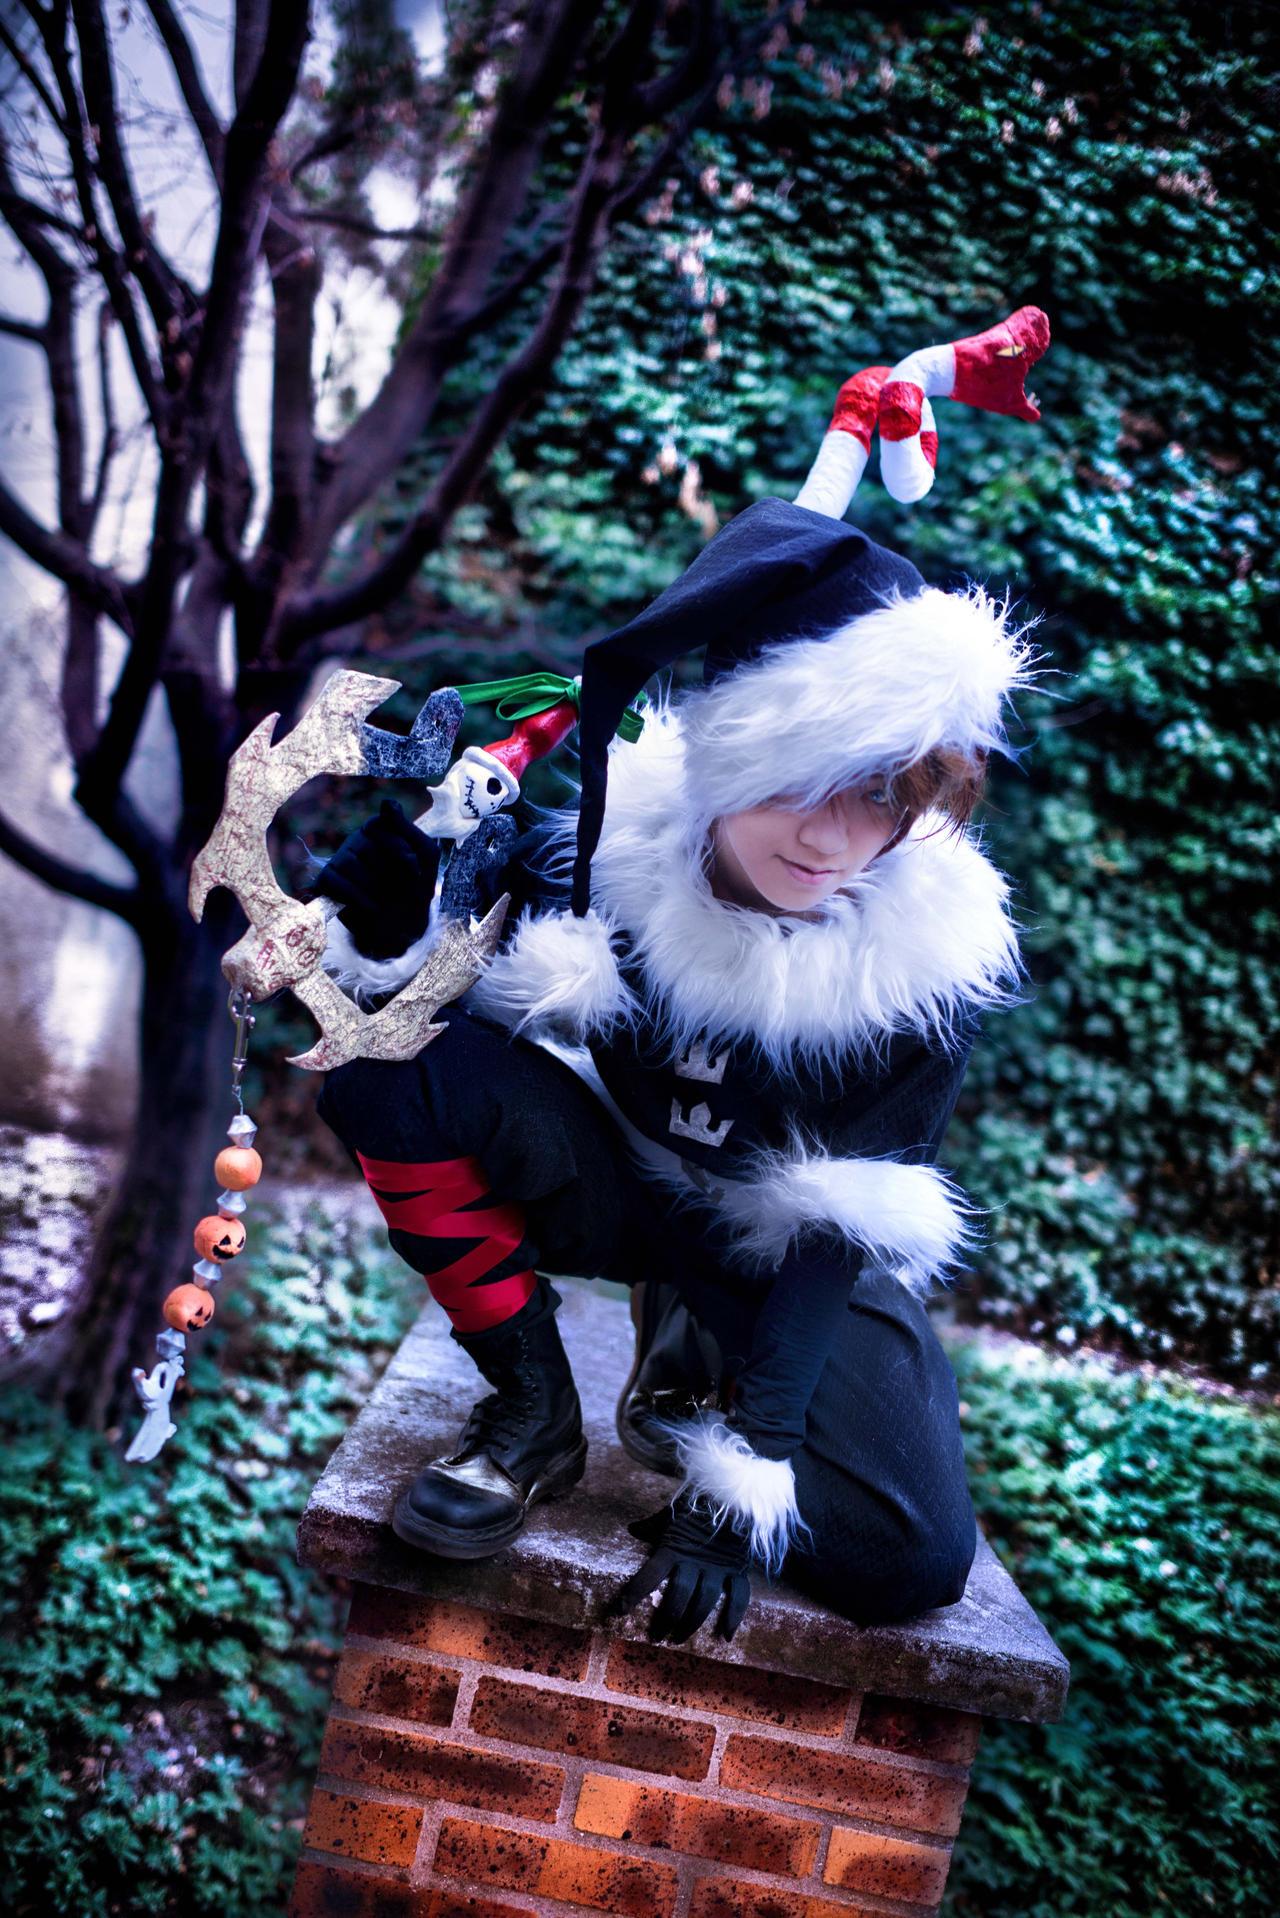 Kingdom Hearts - Santa Helper by TrustOurWorldNow